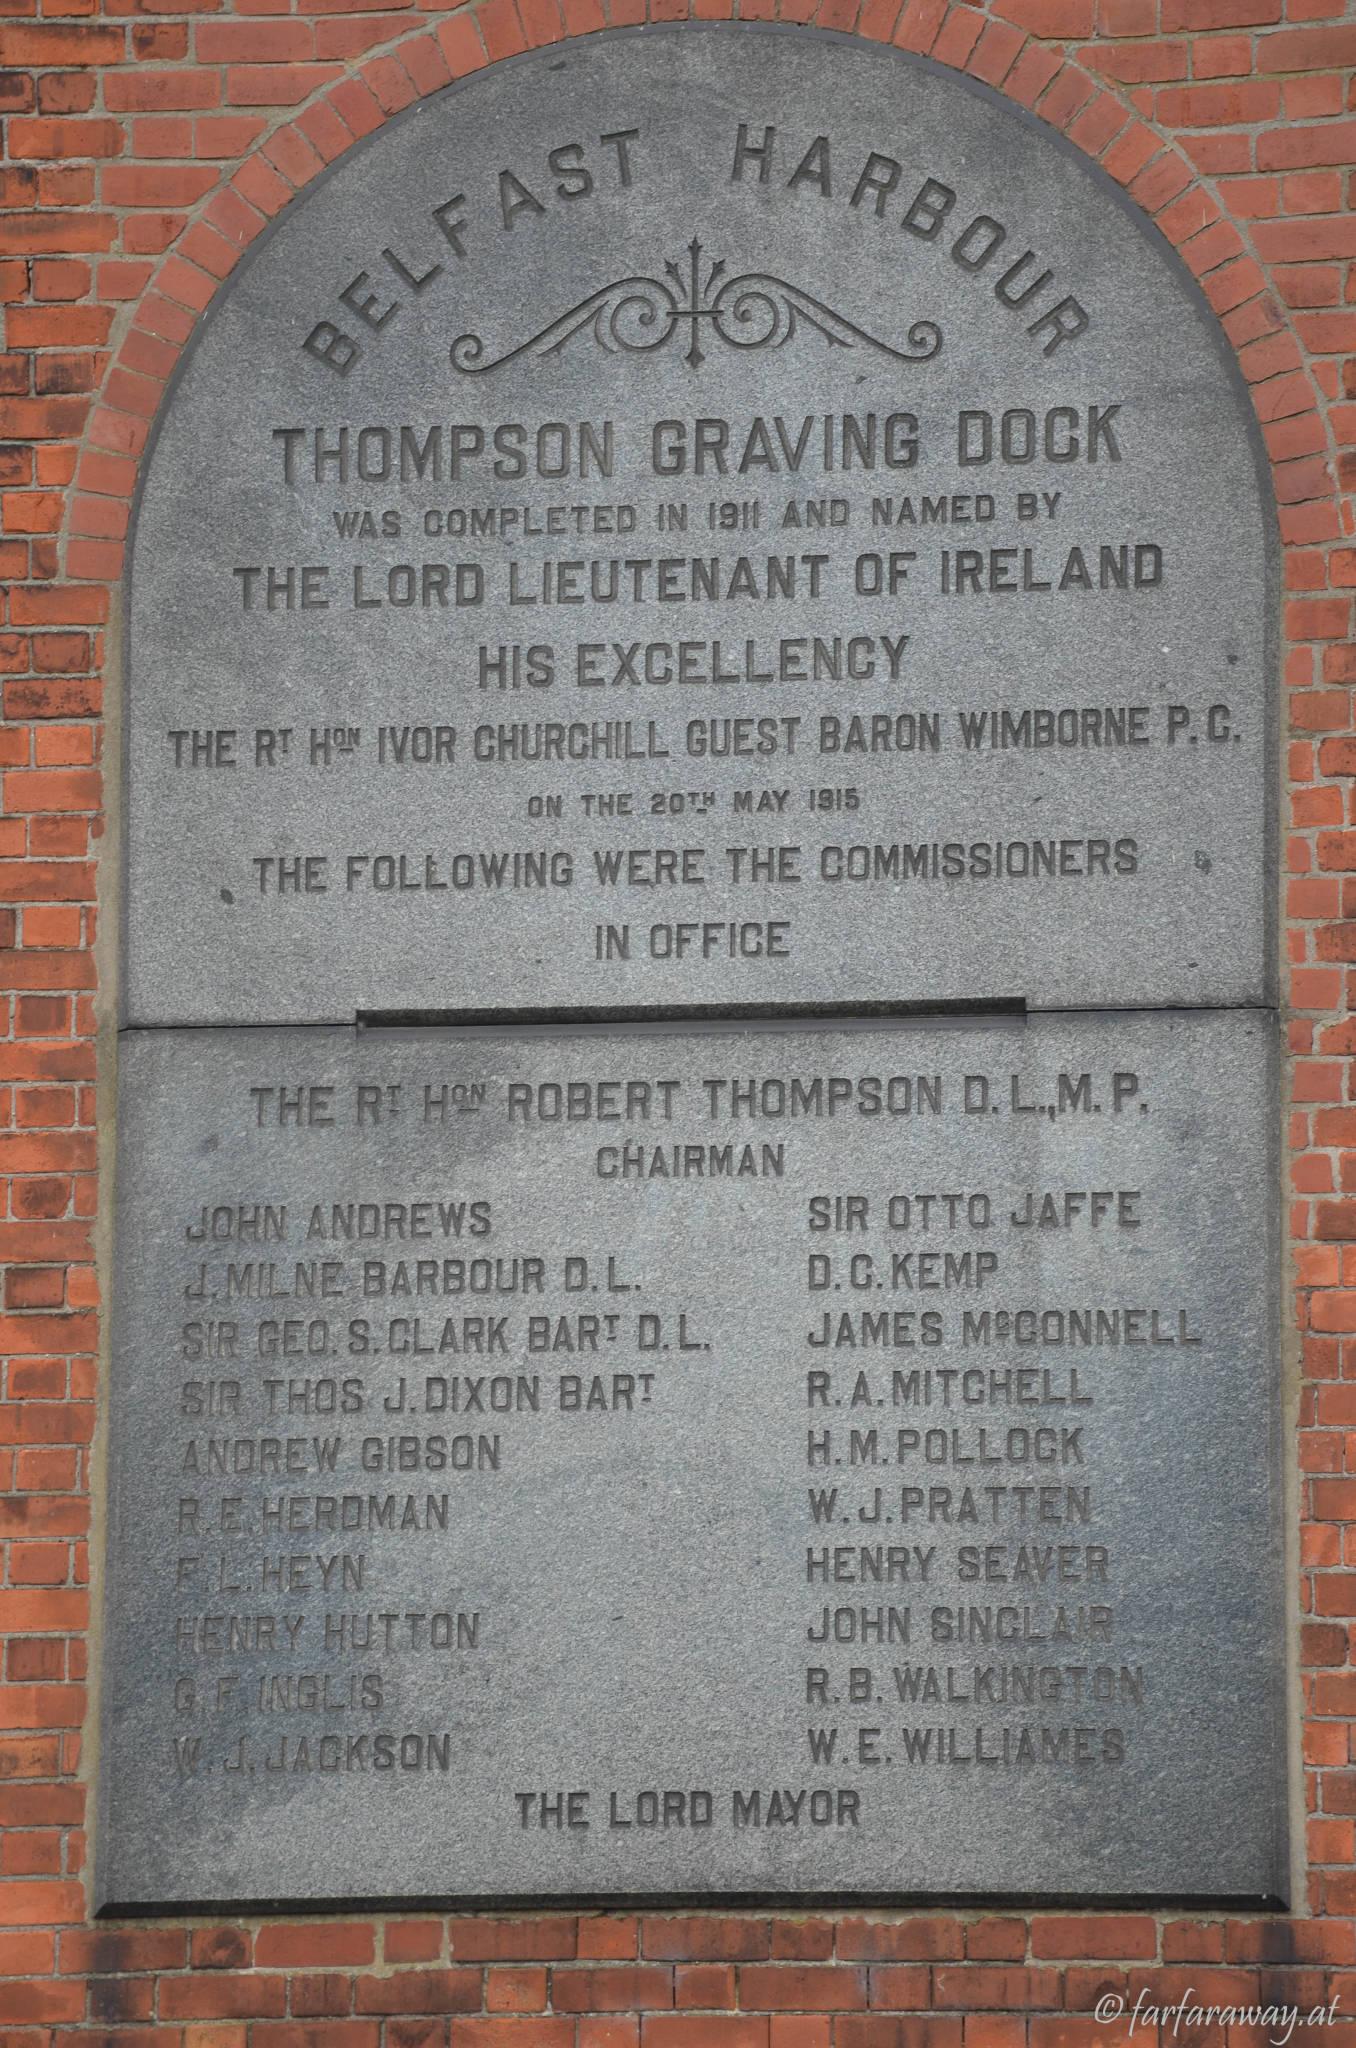 Thompson Graving Dock